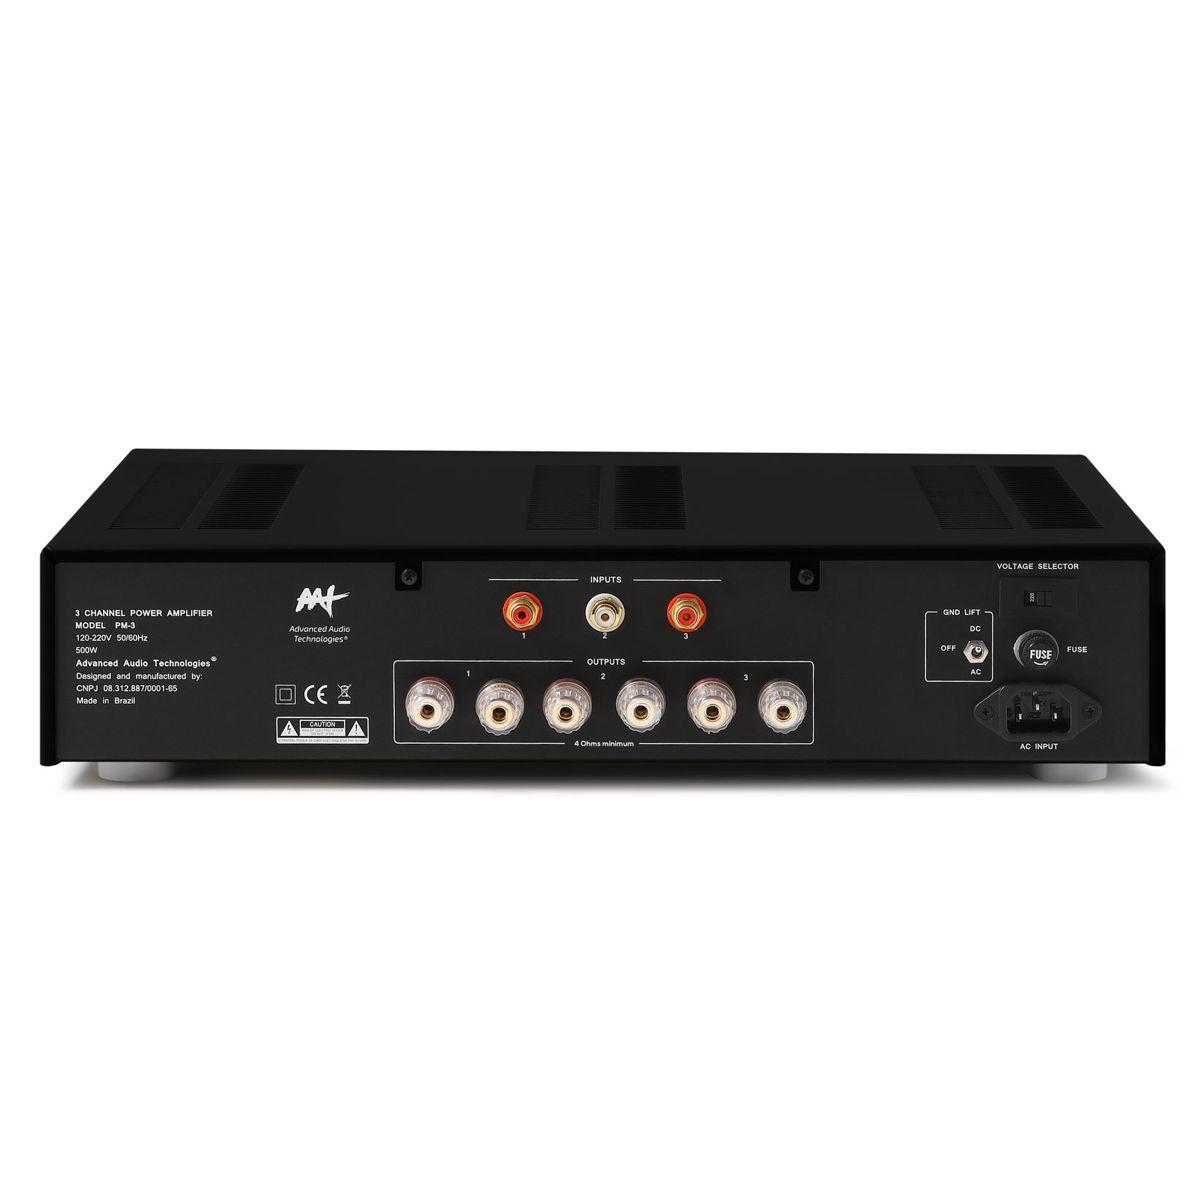 Amplificador de Potência 3 Canais 210W RMS Total  PM-3 AAT